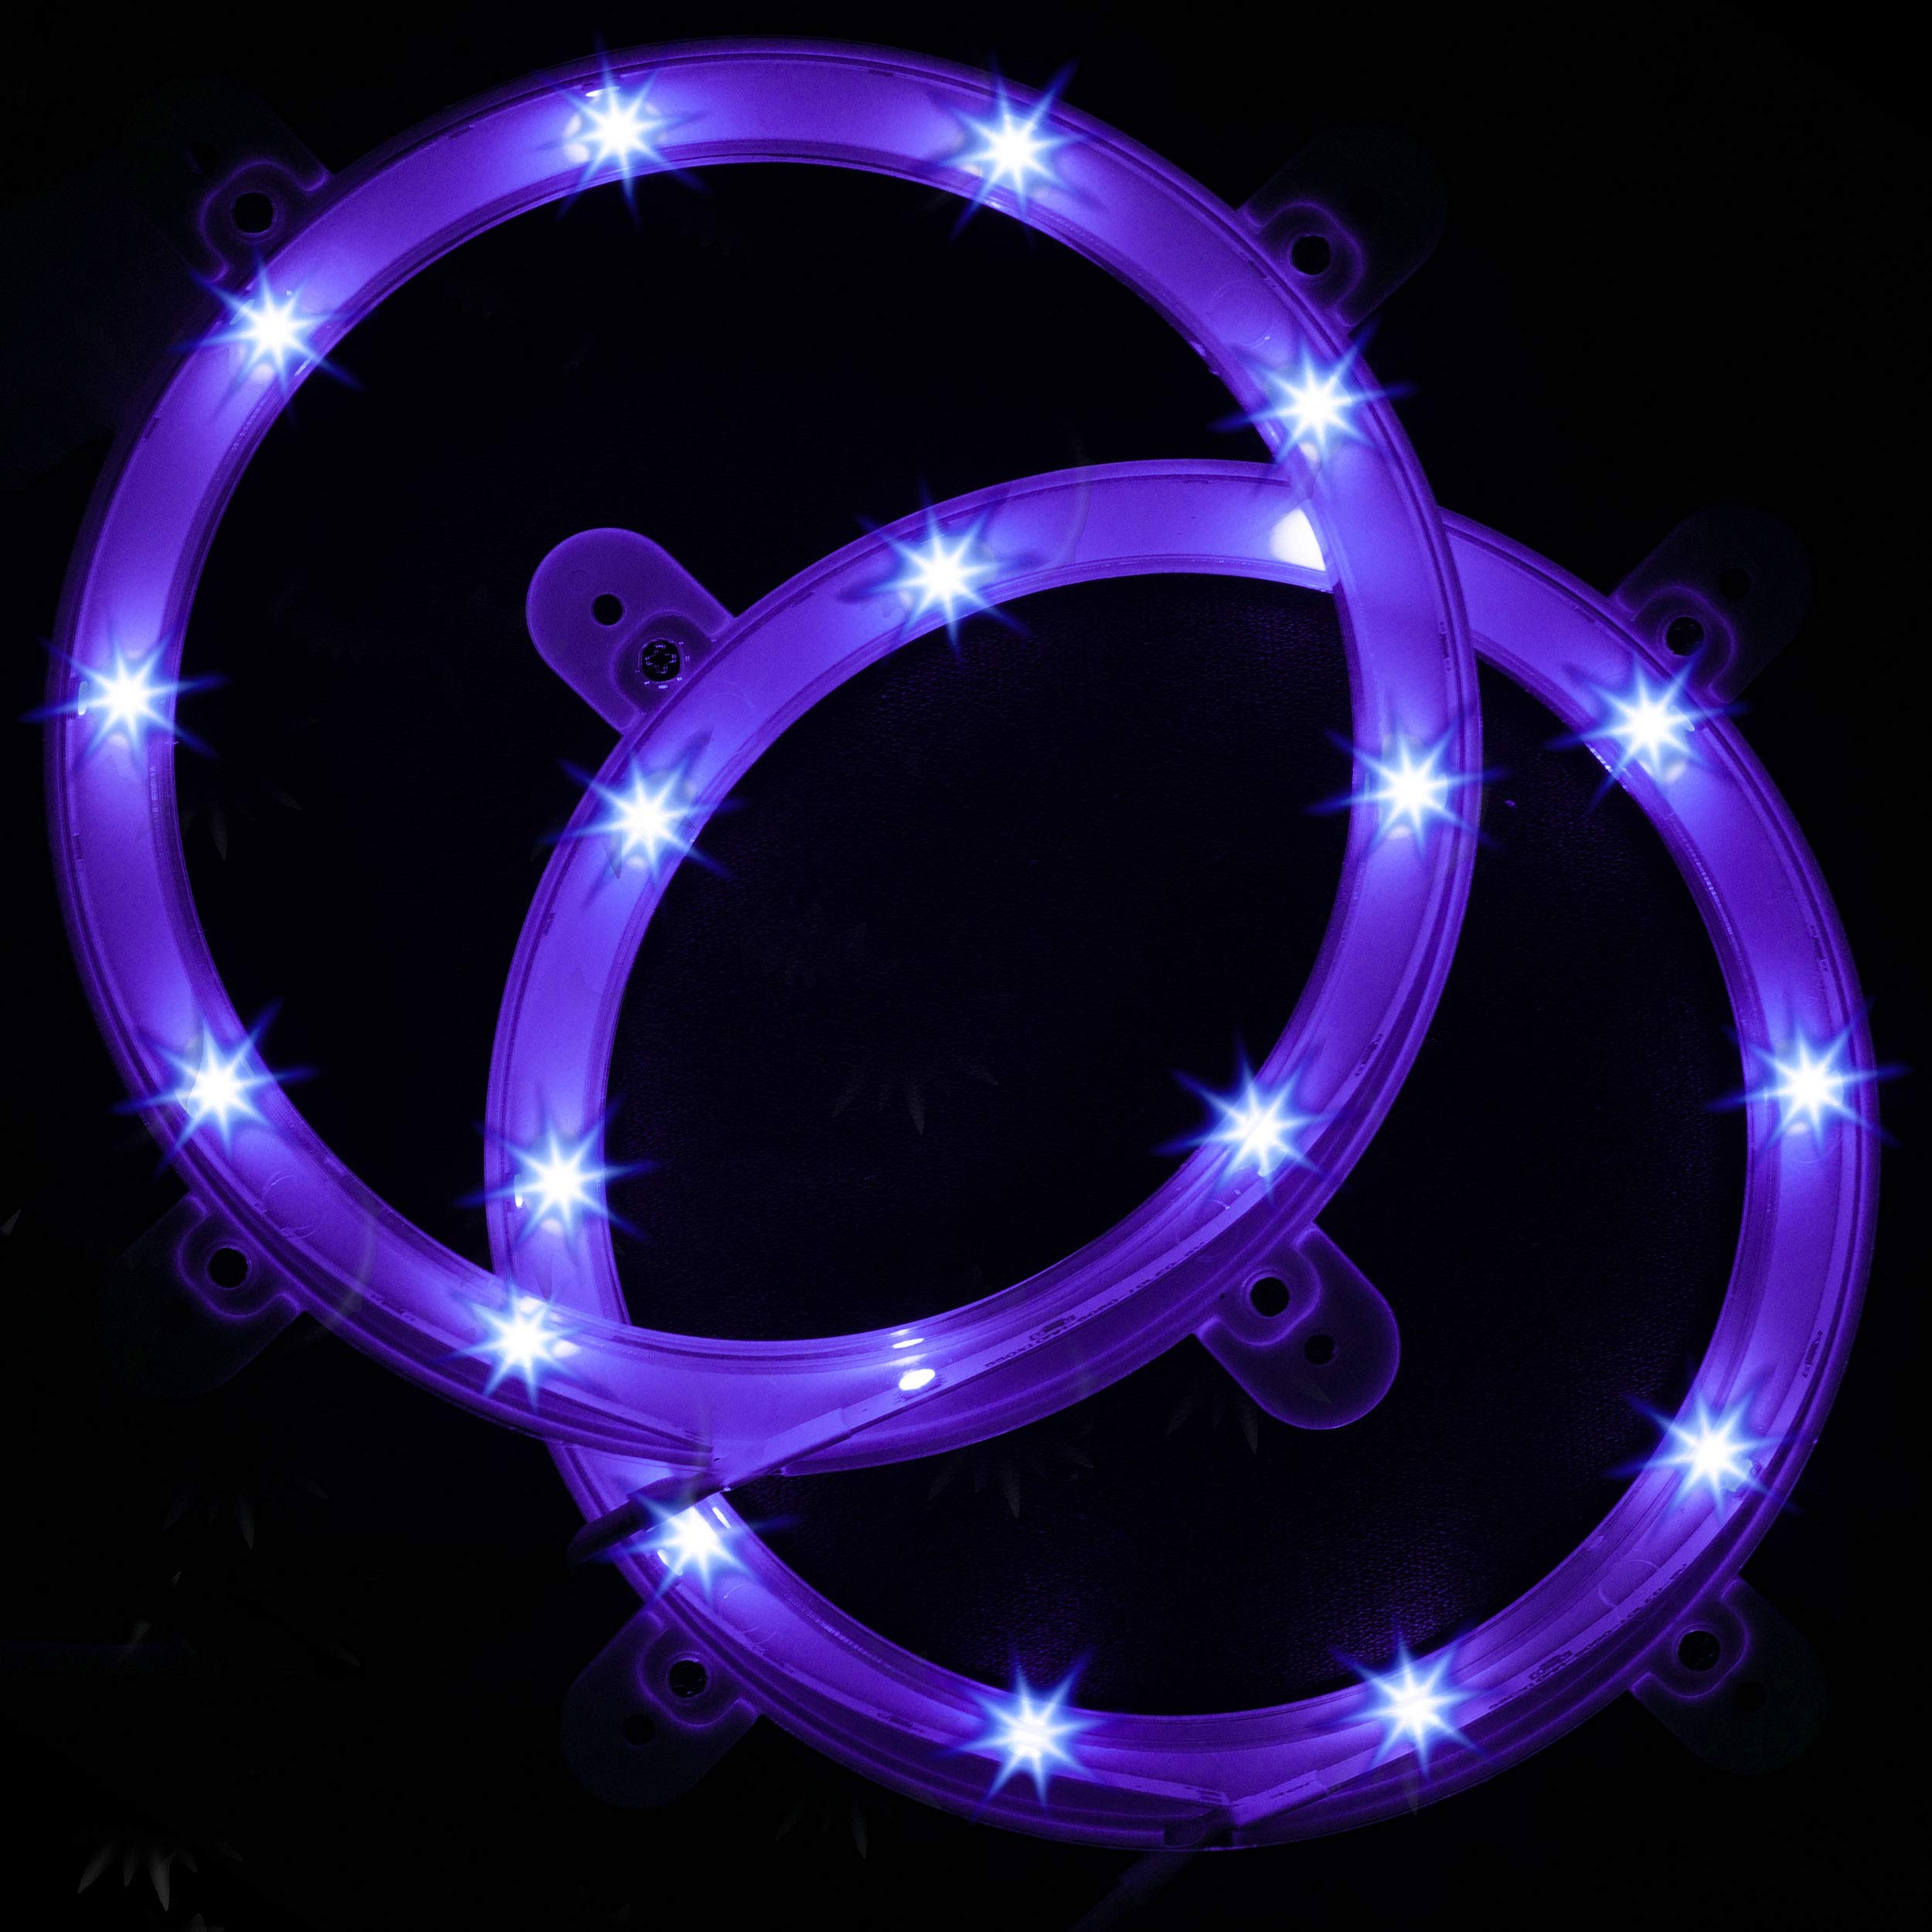 Cornhole Board Lights - Purple LED Corn Hole Lighting Kit for Playing at Night by Play Platoon